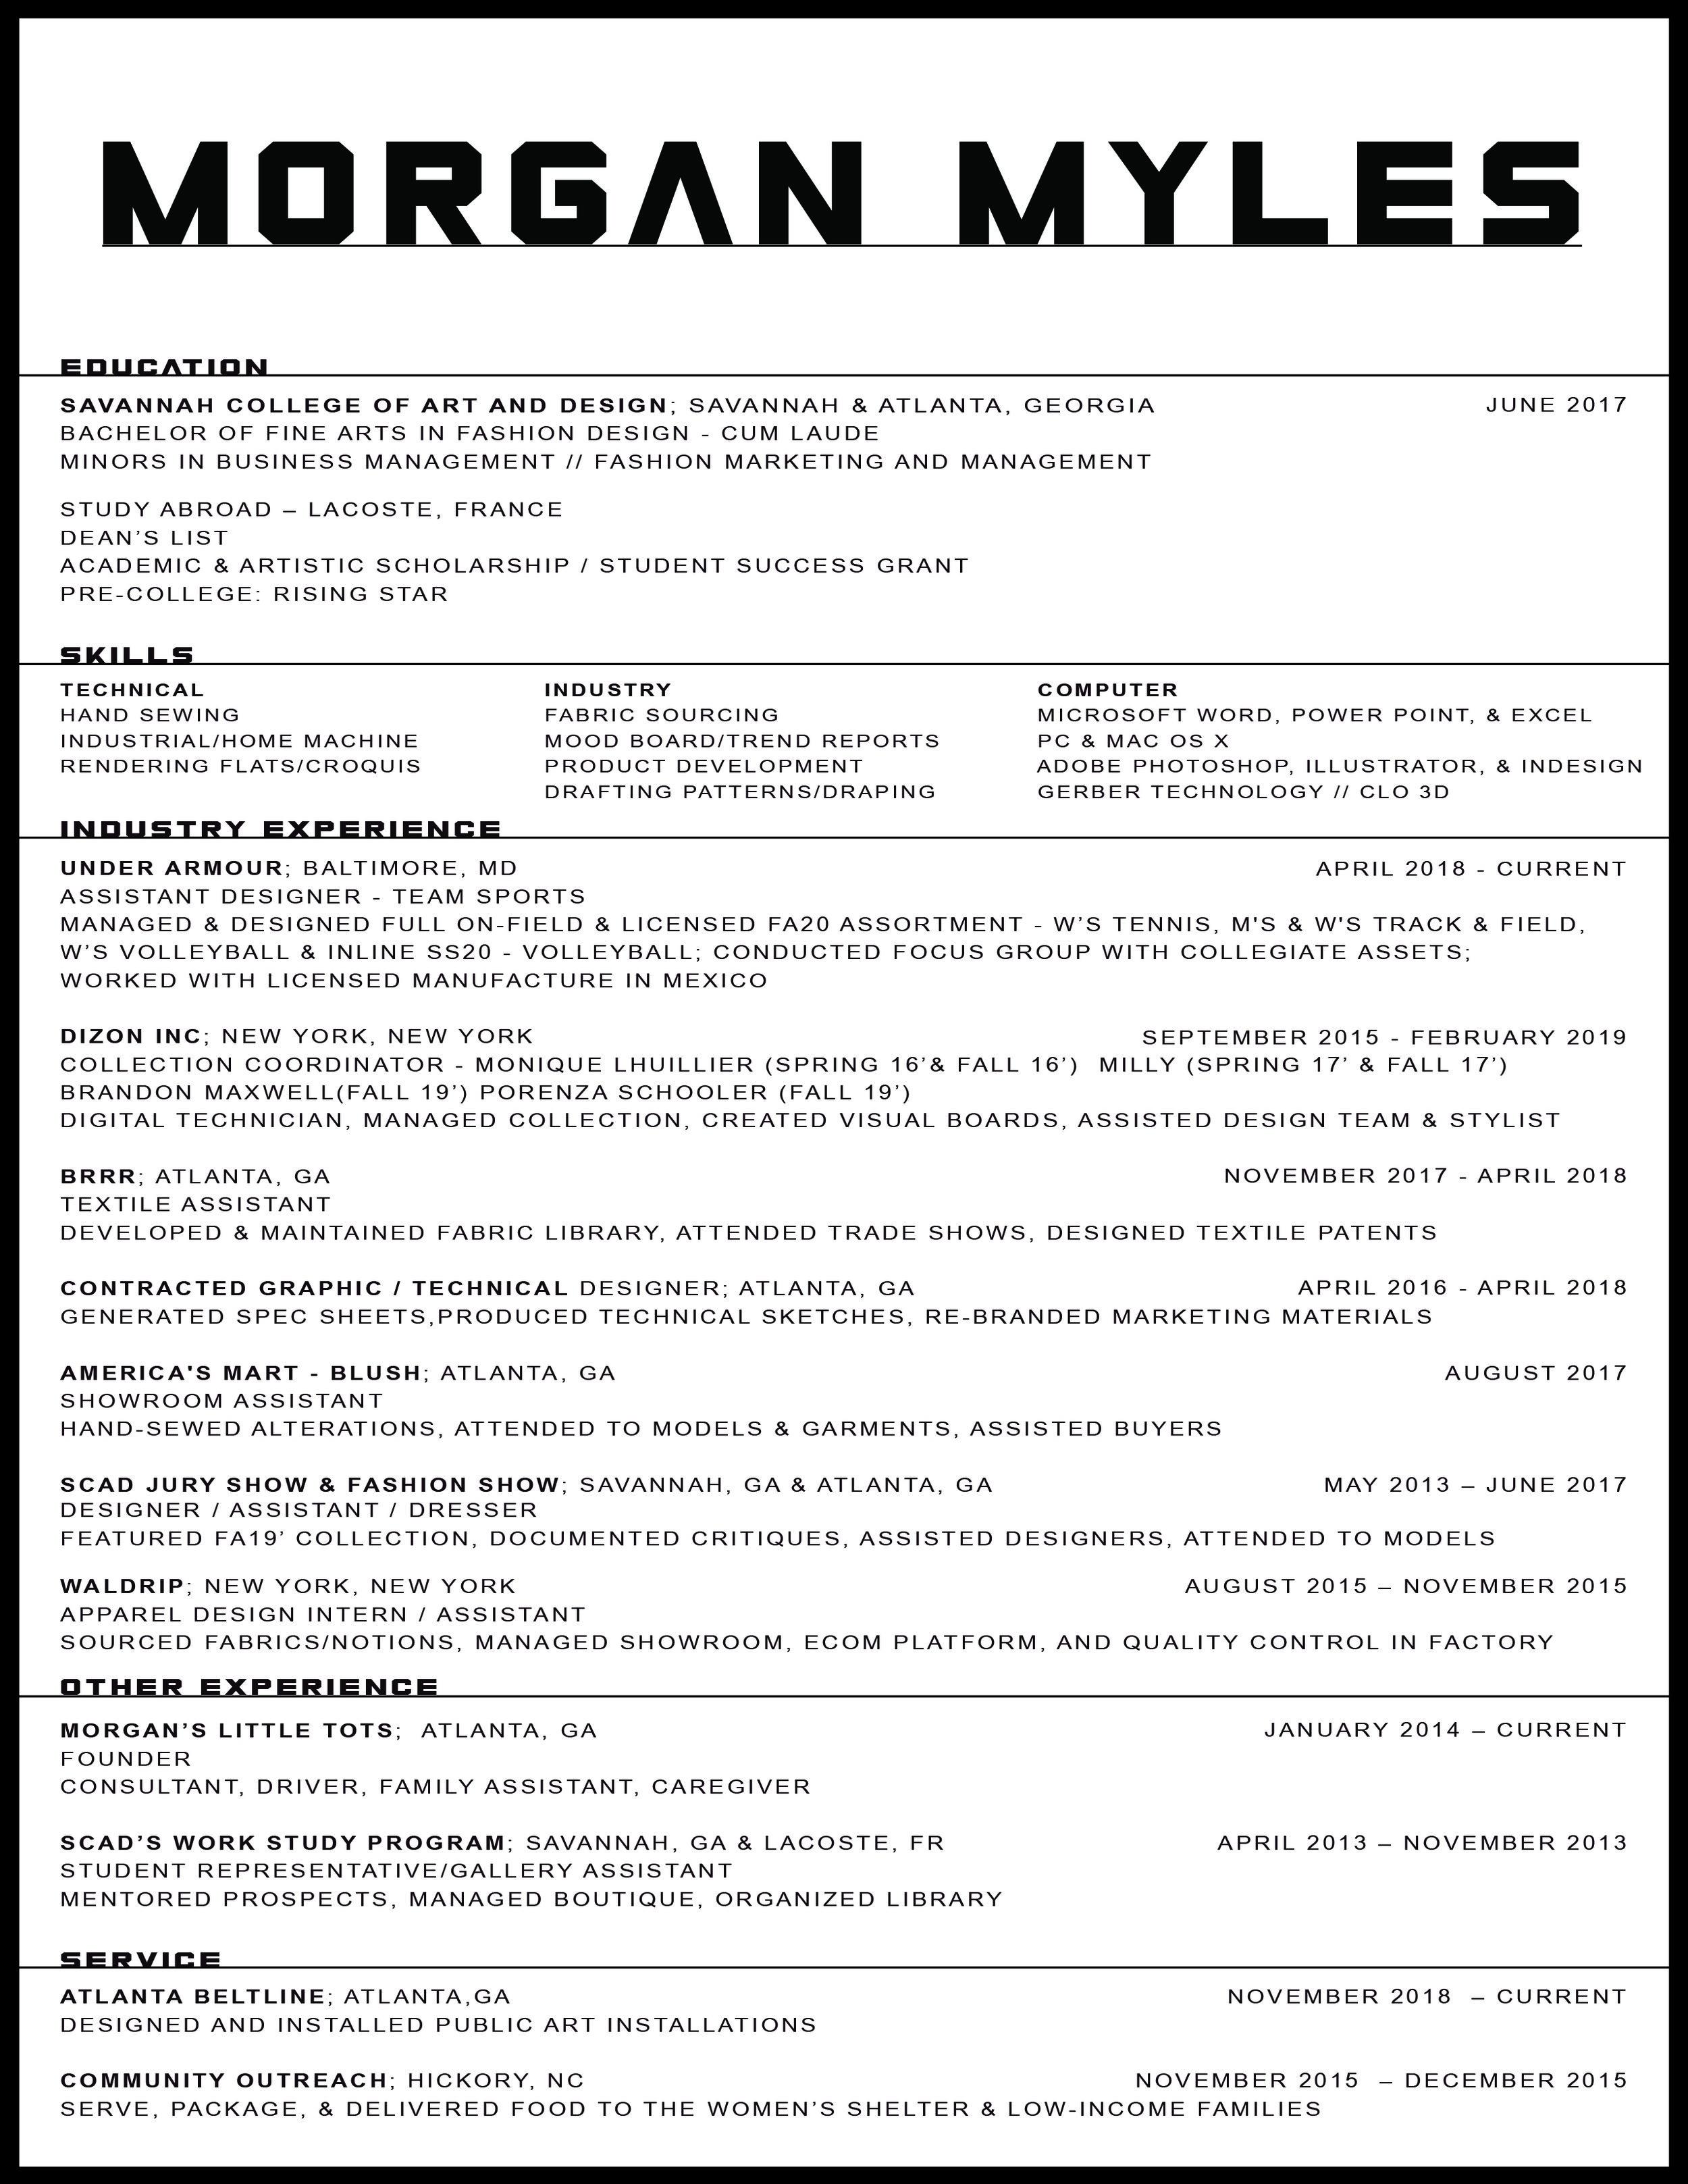 Resume-02.jpg